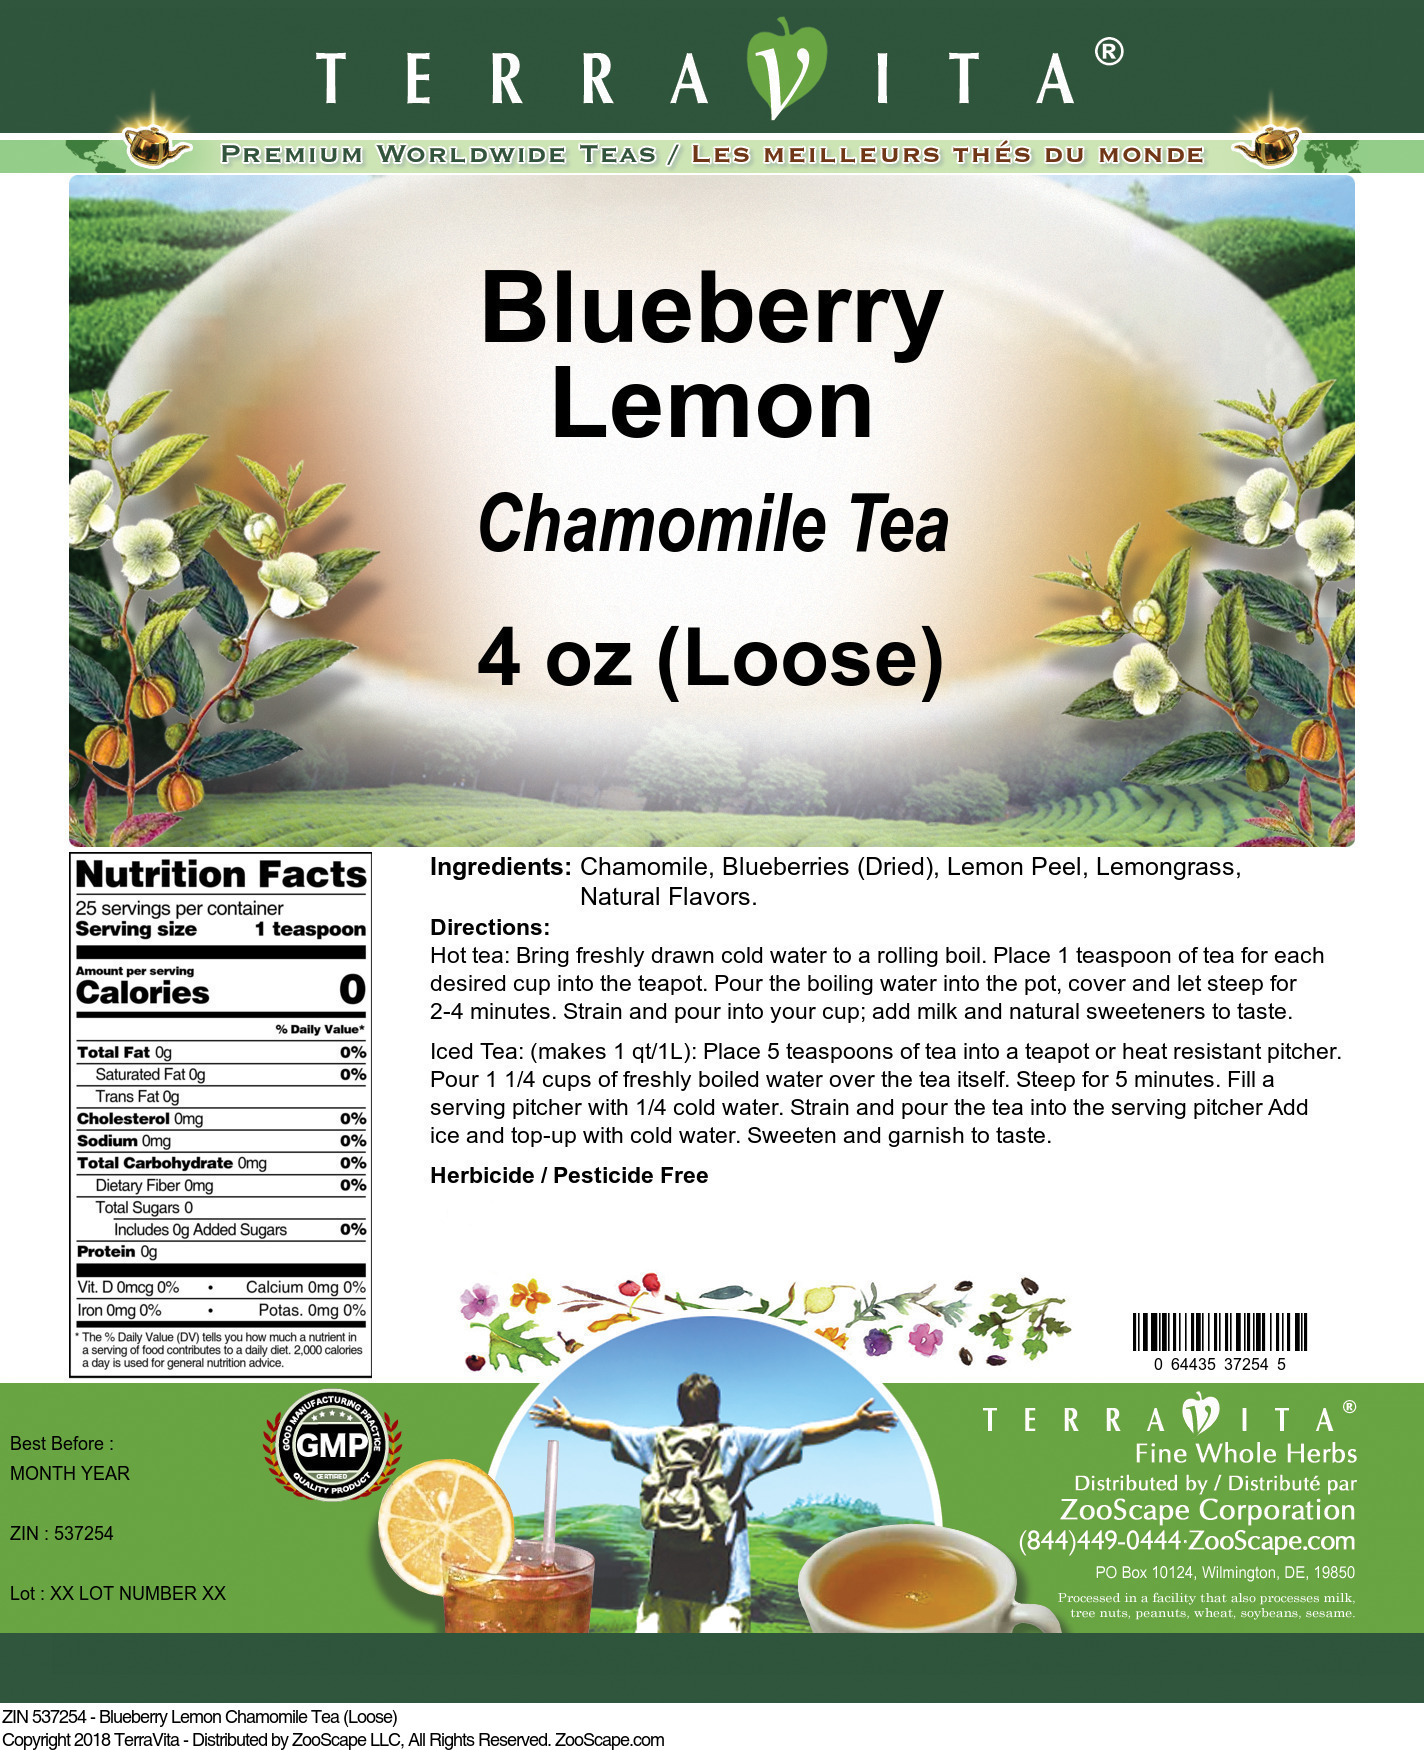 Blueberry Lemon Chamomile Tea (Loose)